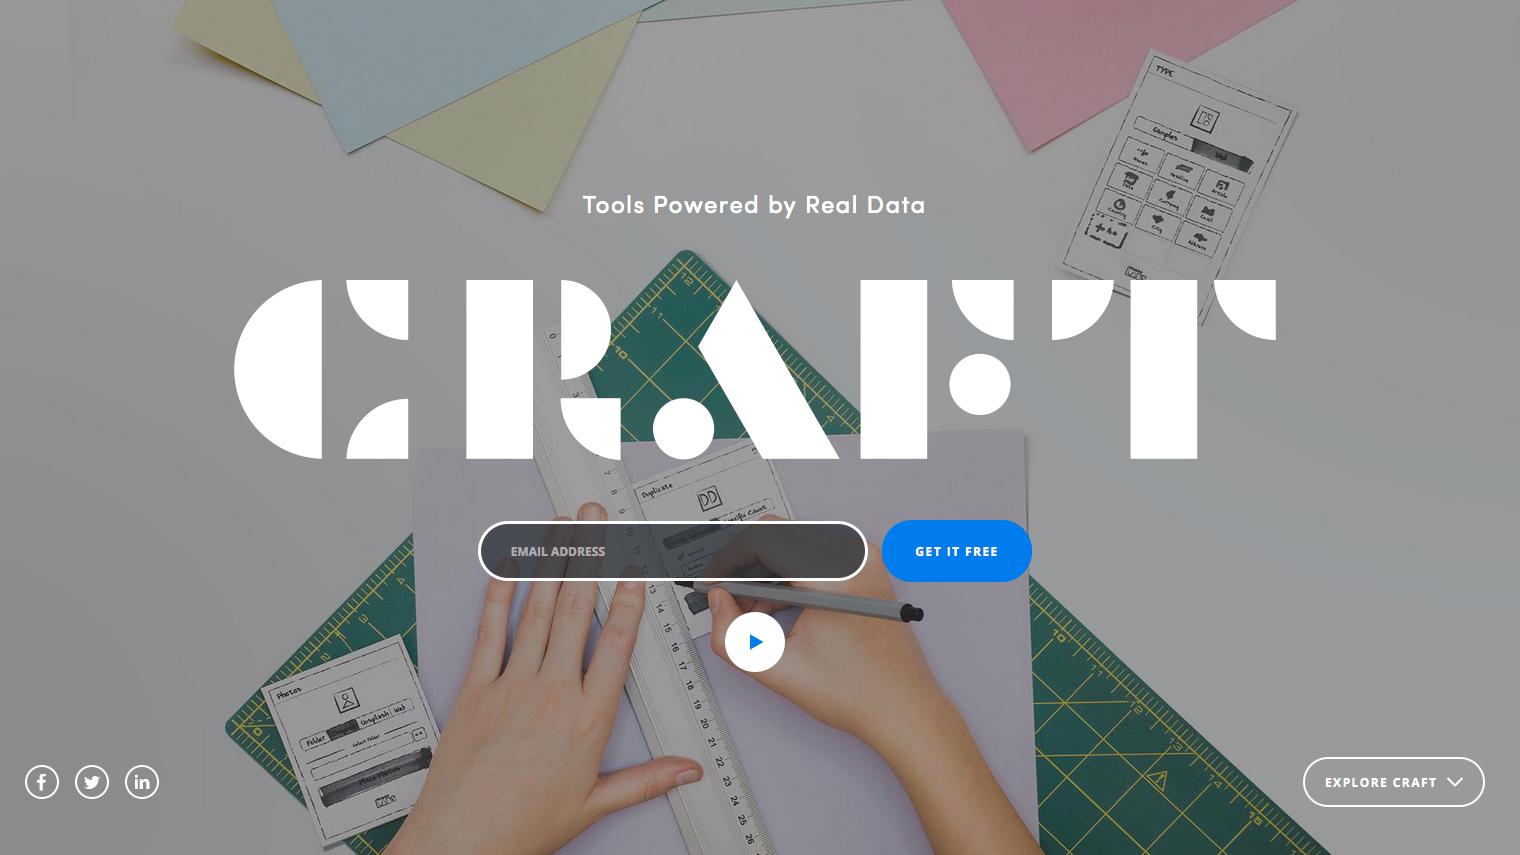 Best graphic design tools for April: Craft